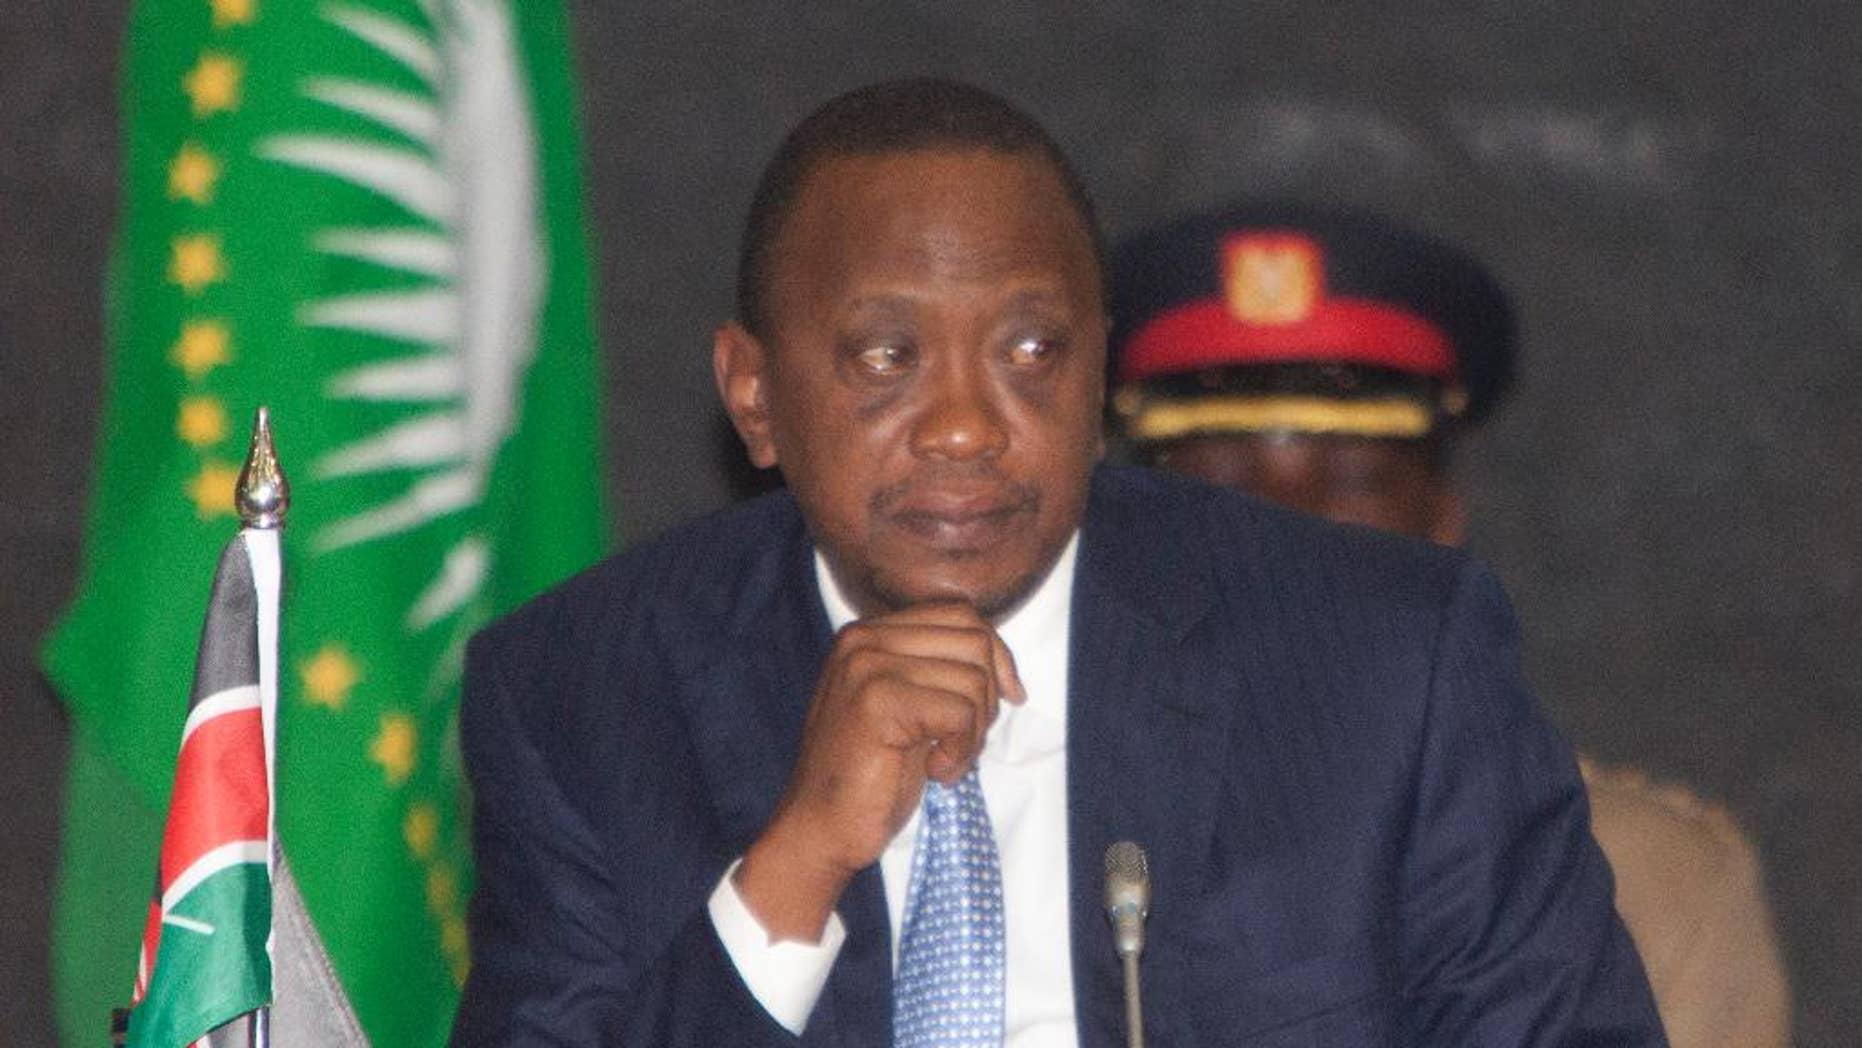 President of Kenya, Uhuru Kenyatta, listens during the AU Summit, Tuesday, Sept. 2, 2014, in Nairobi, Kenya.  A one-day African Union Peace and Security Summit  started in Nairobi, Kenya, Tuesday. (AP Photo/Sayyid Azim)